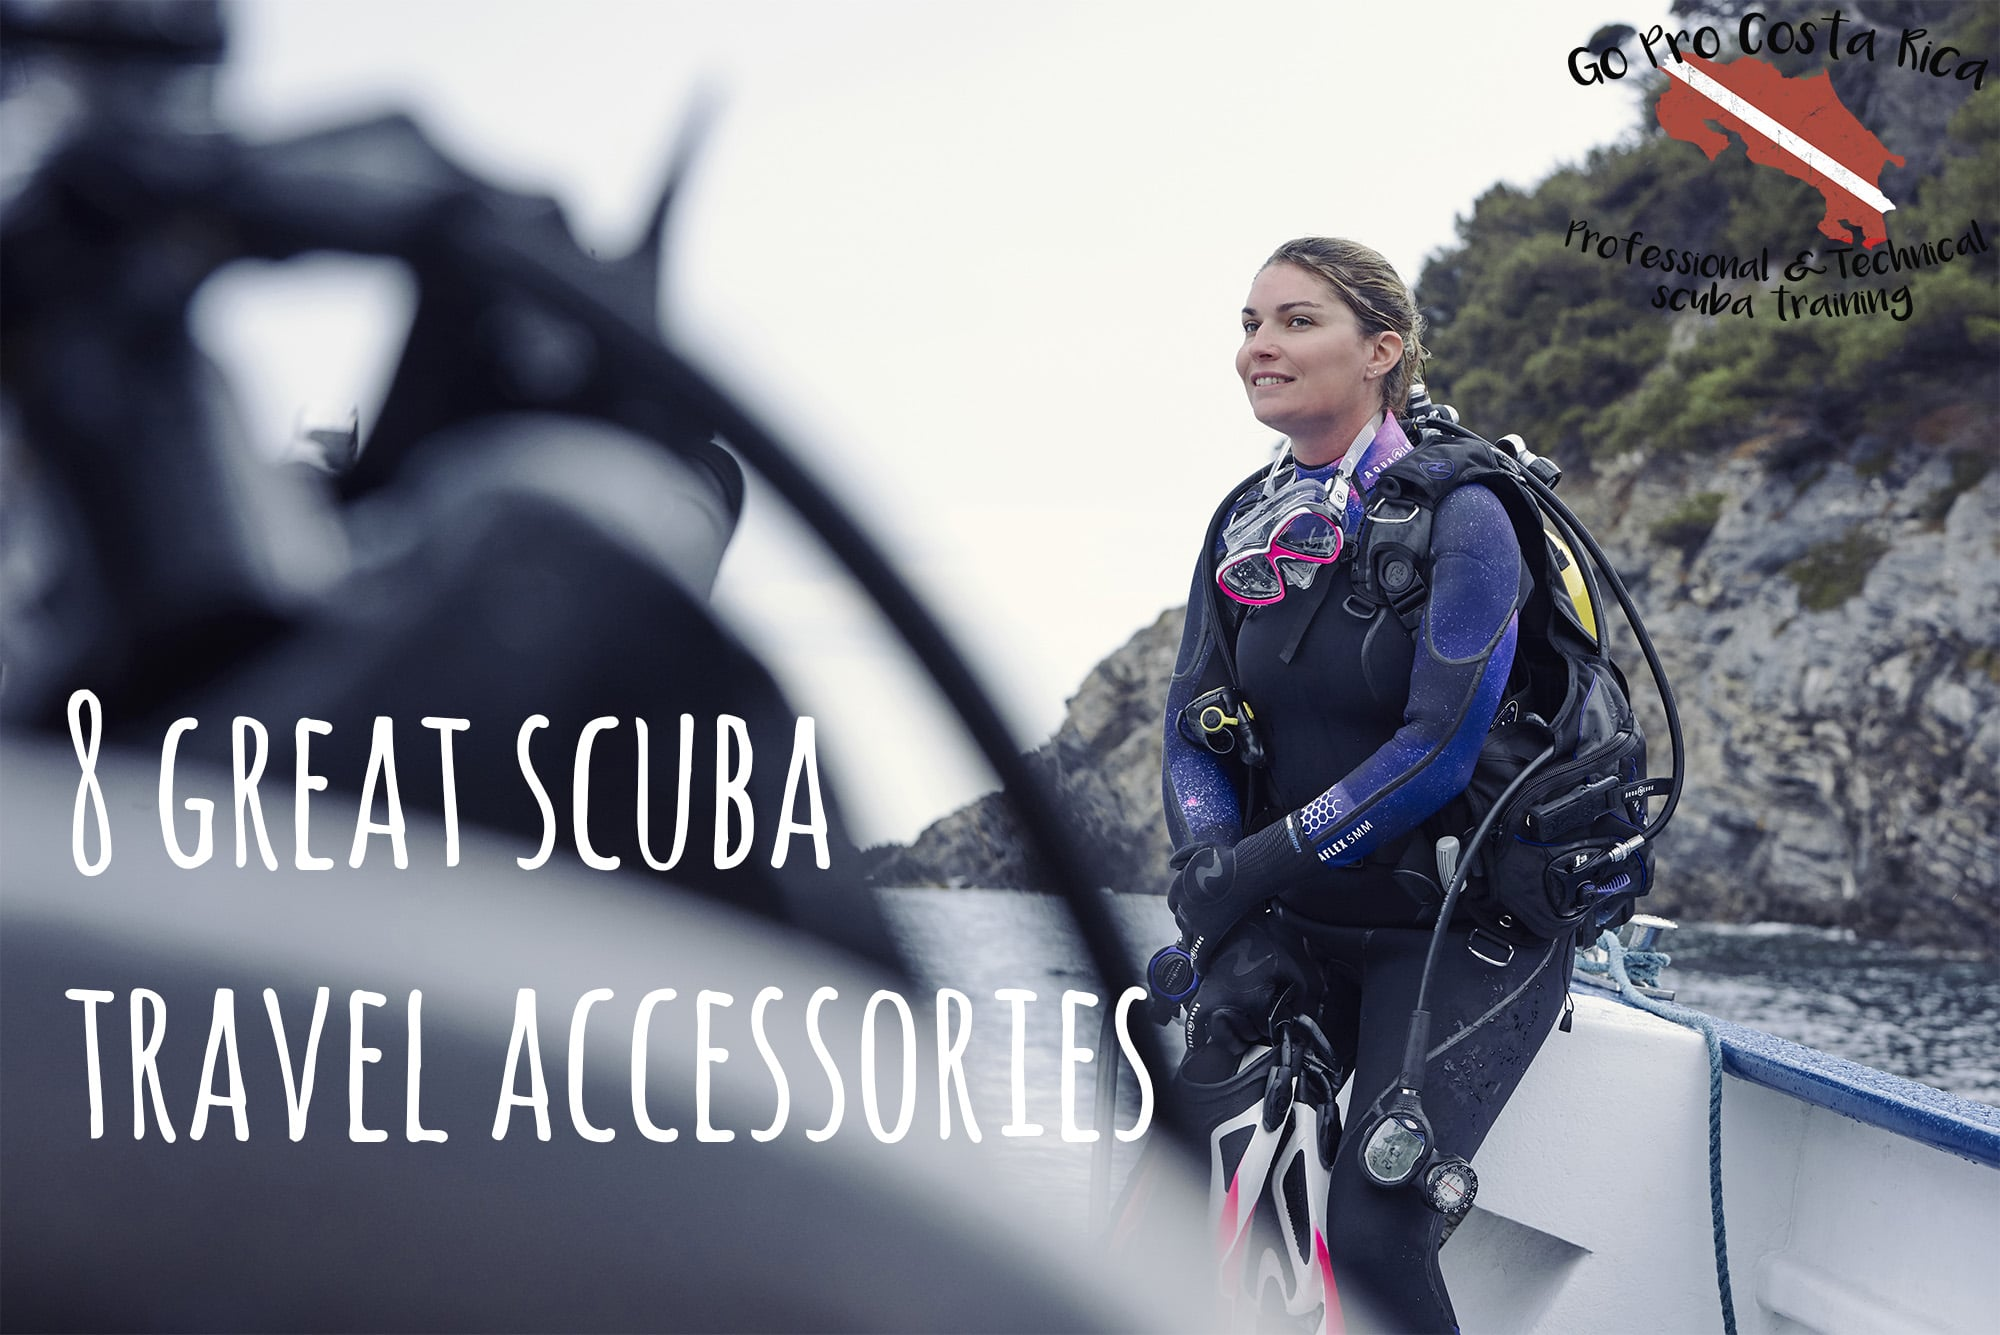 8 Great Scuba Travel Accessories